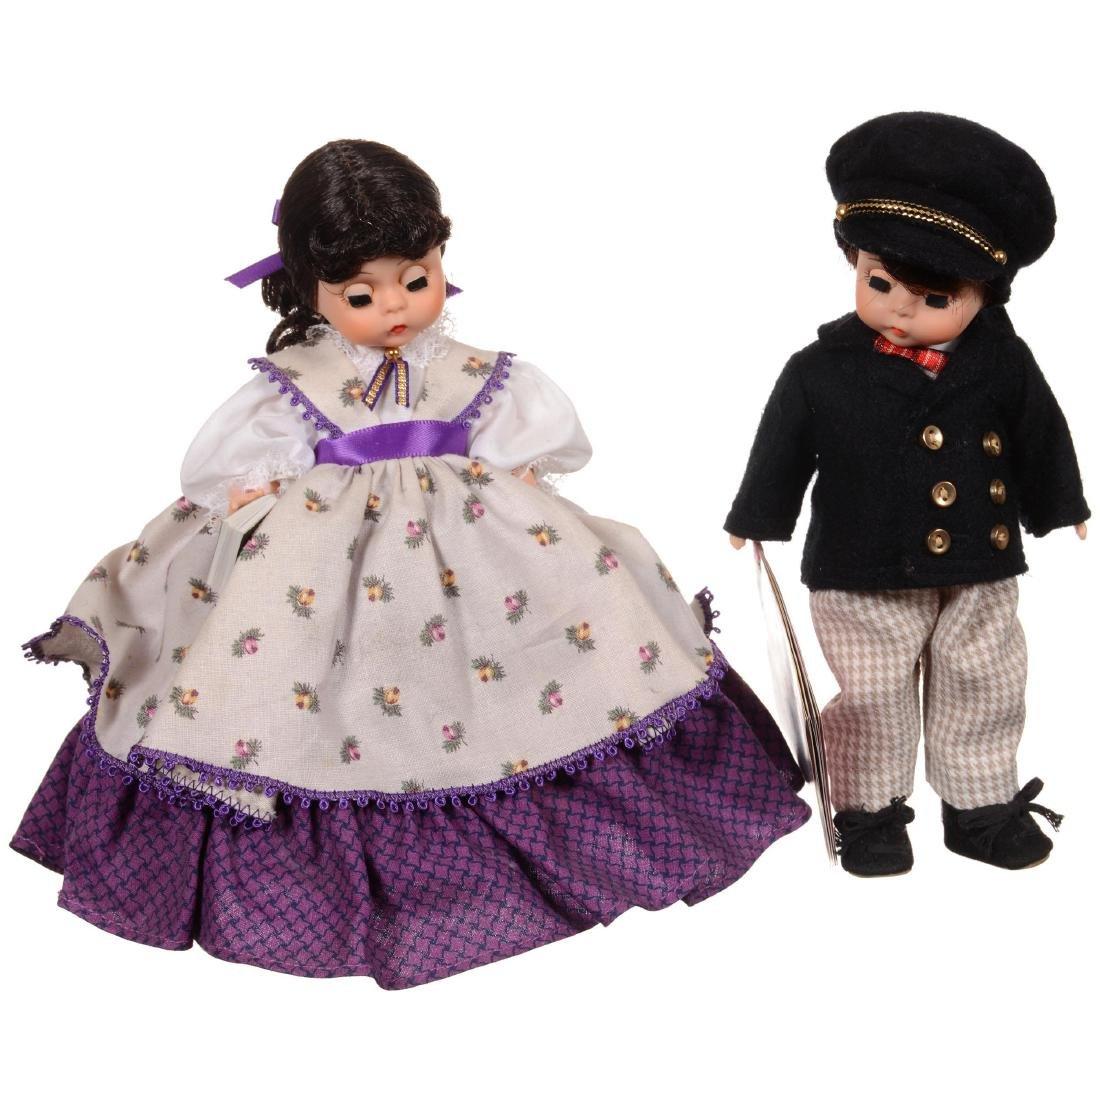 Ten Madame Alexander Dolls in Original Boxes - 3